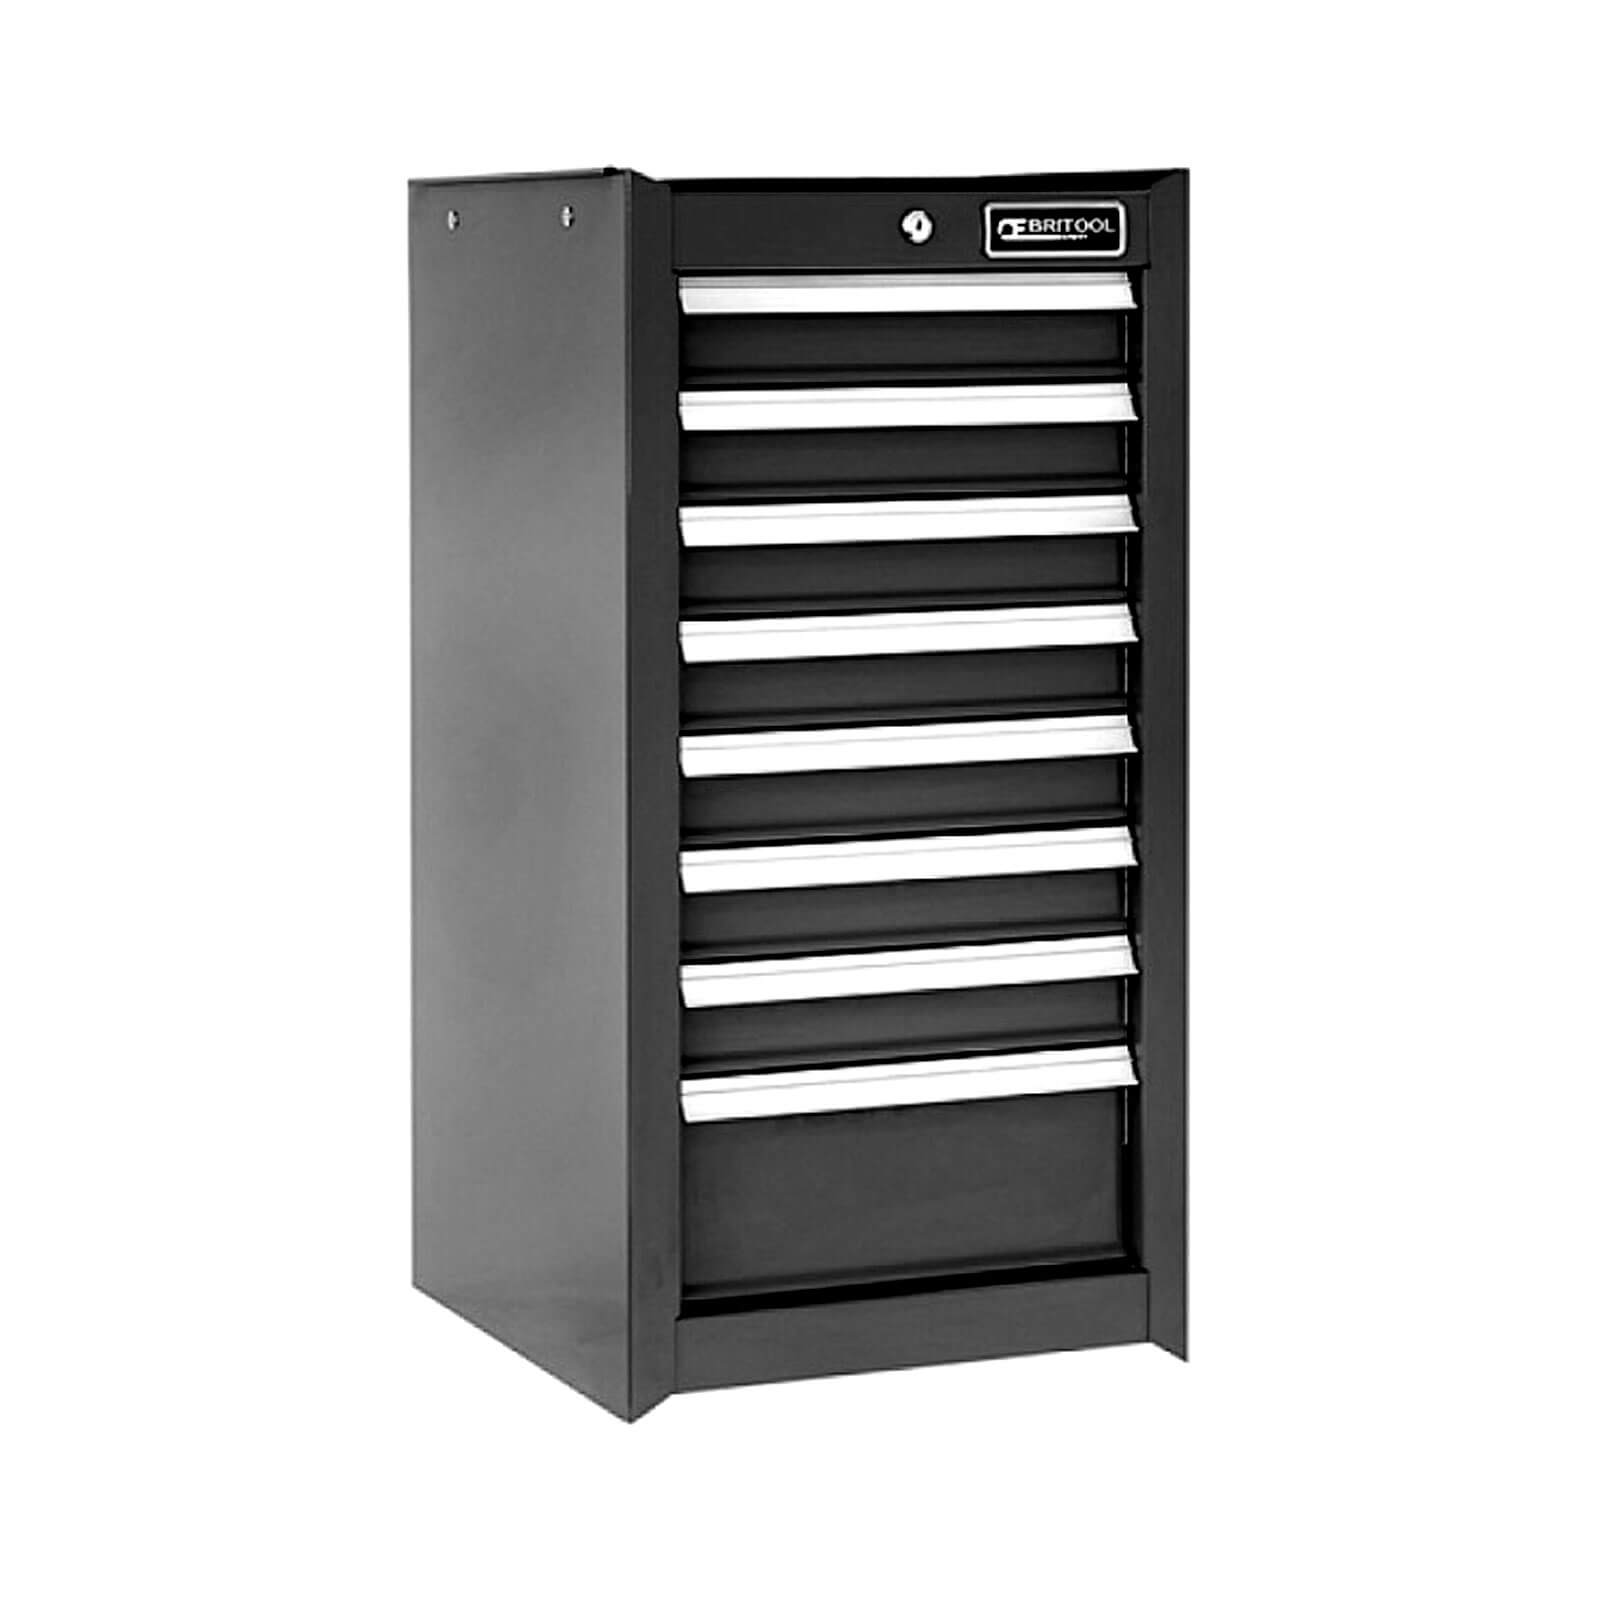 Image of Britool 8 Drawer Tool Cabinet Black